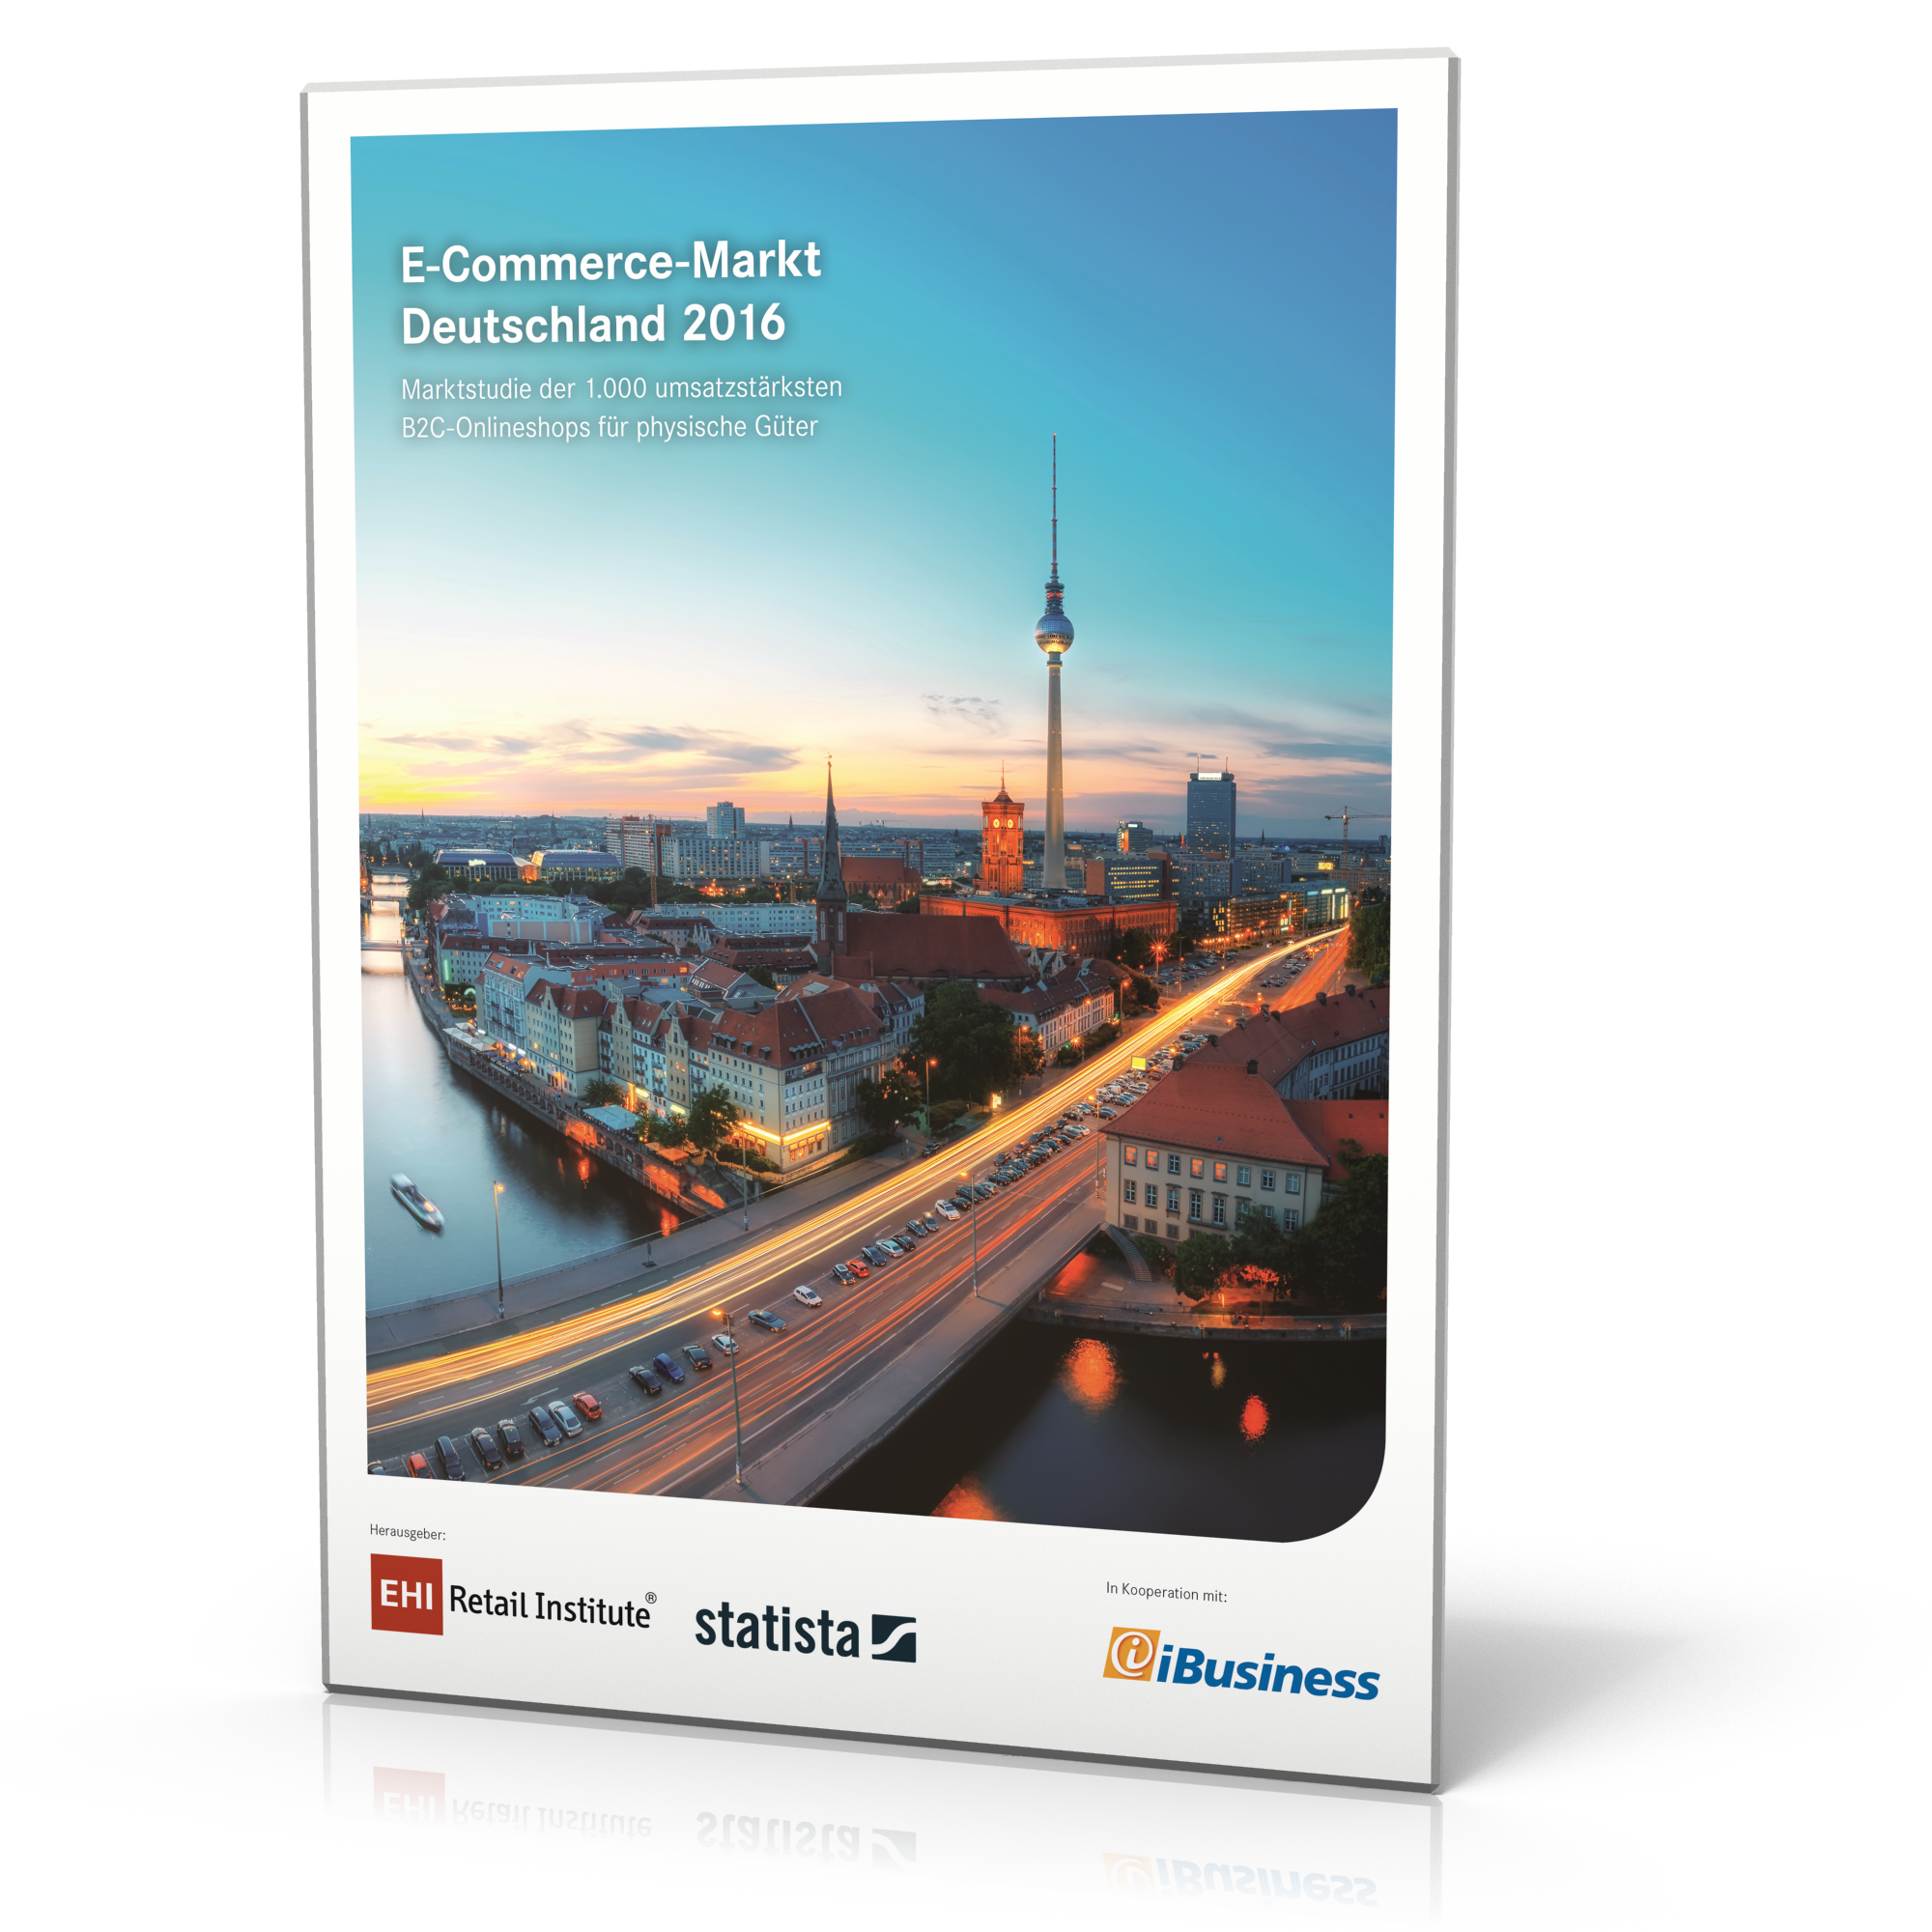 E-Commerce market Germany 2016